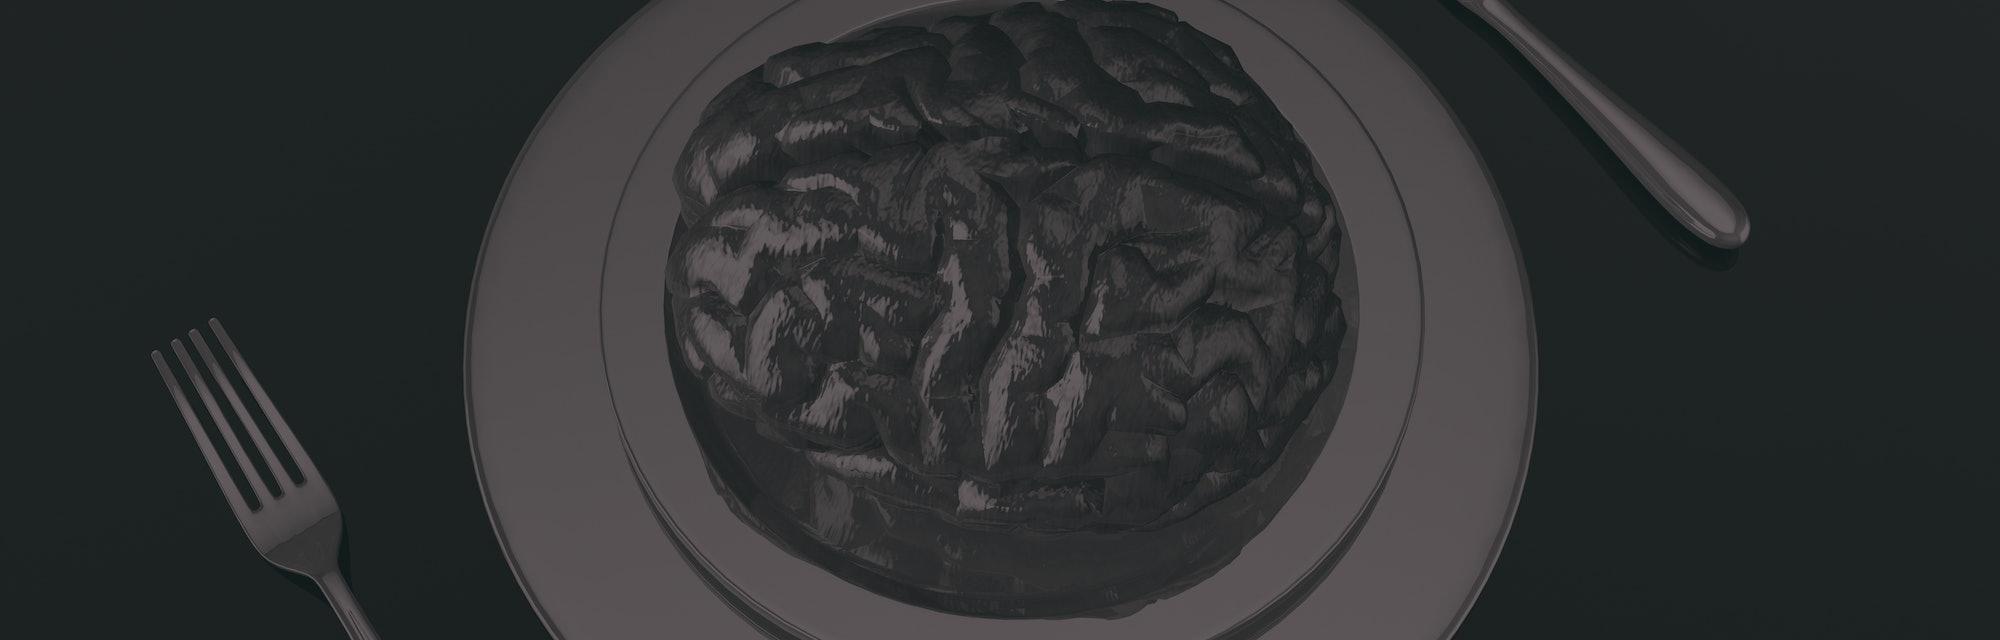 Brain on a dinner plate.